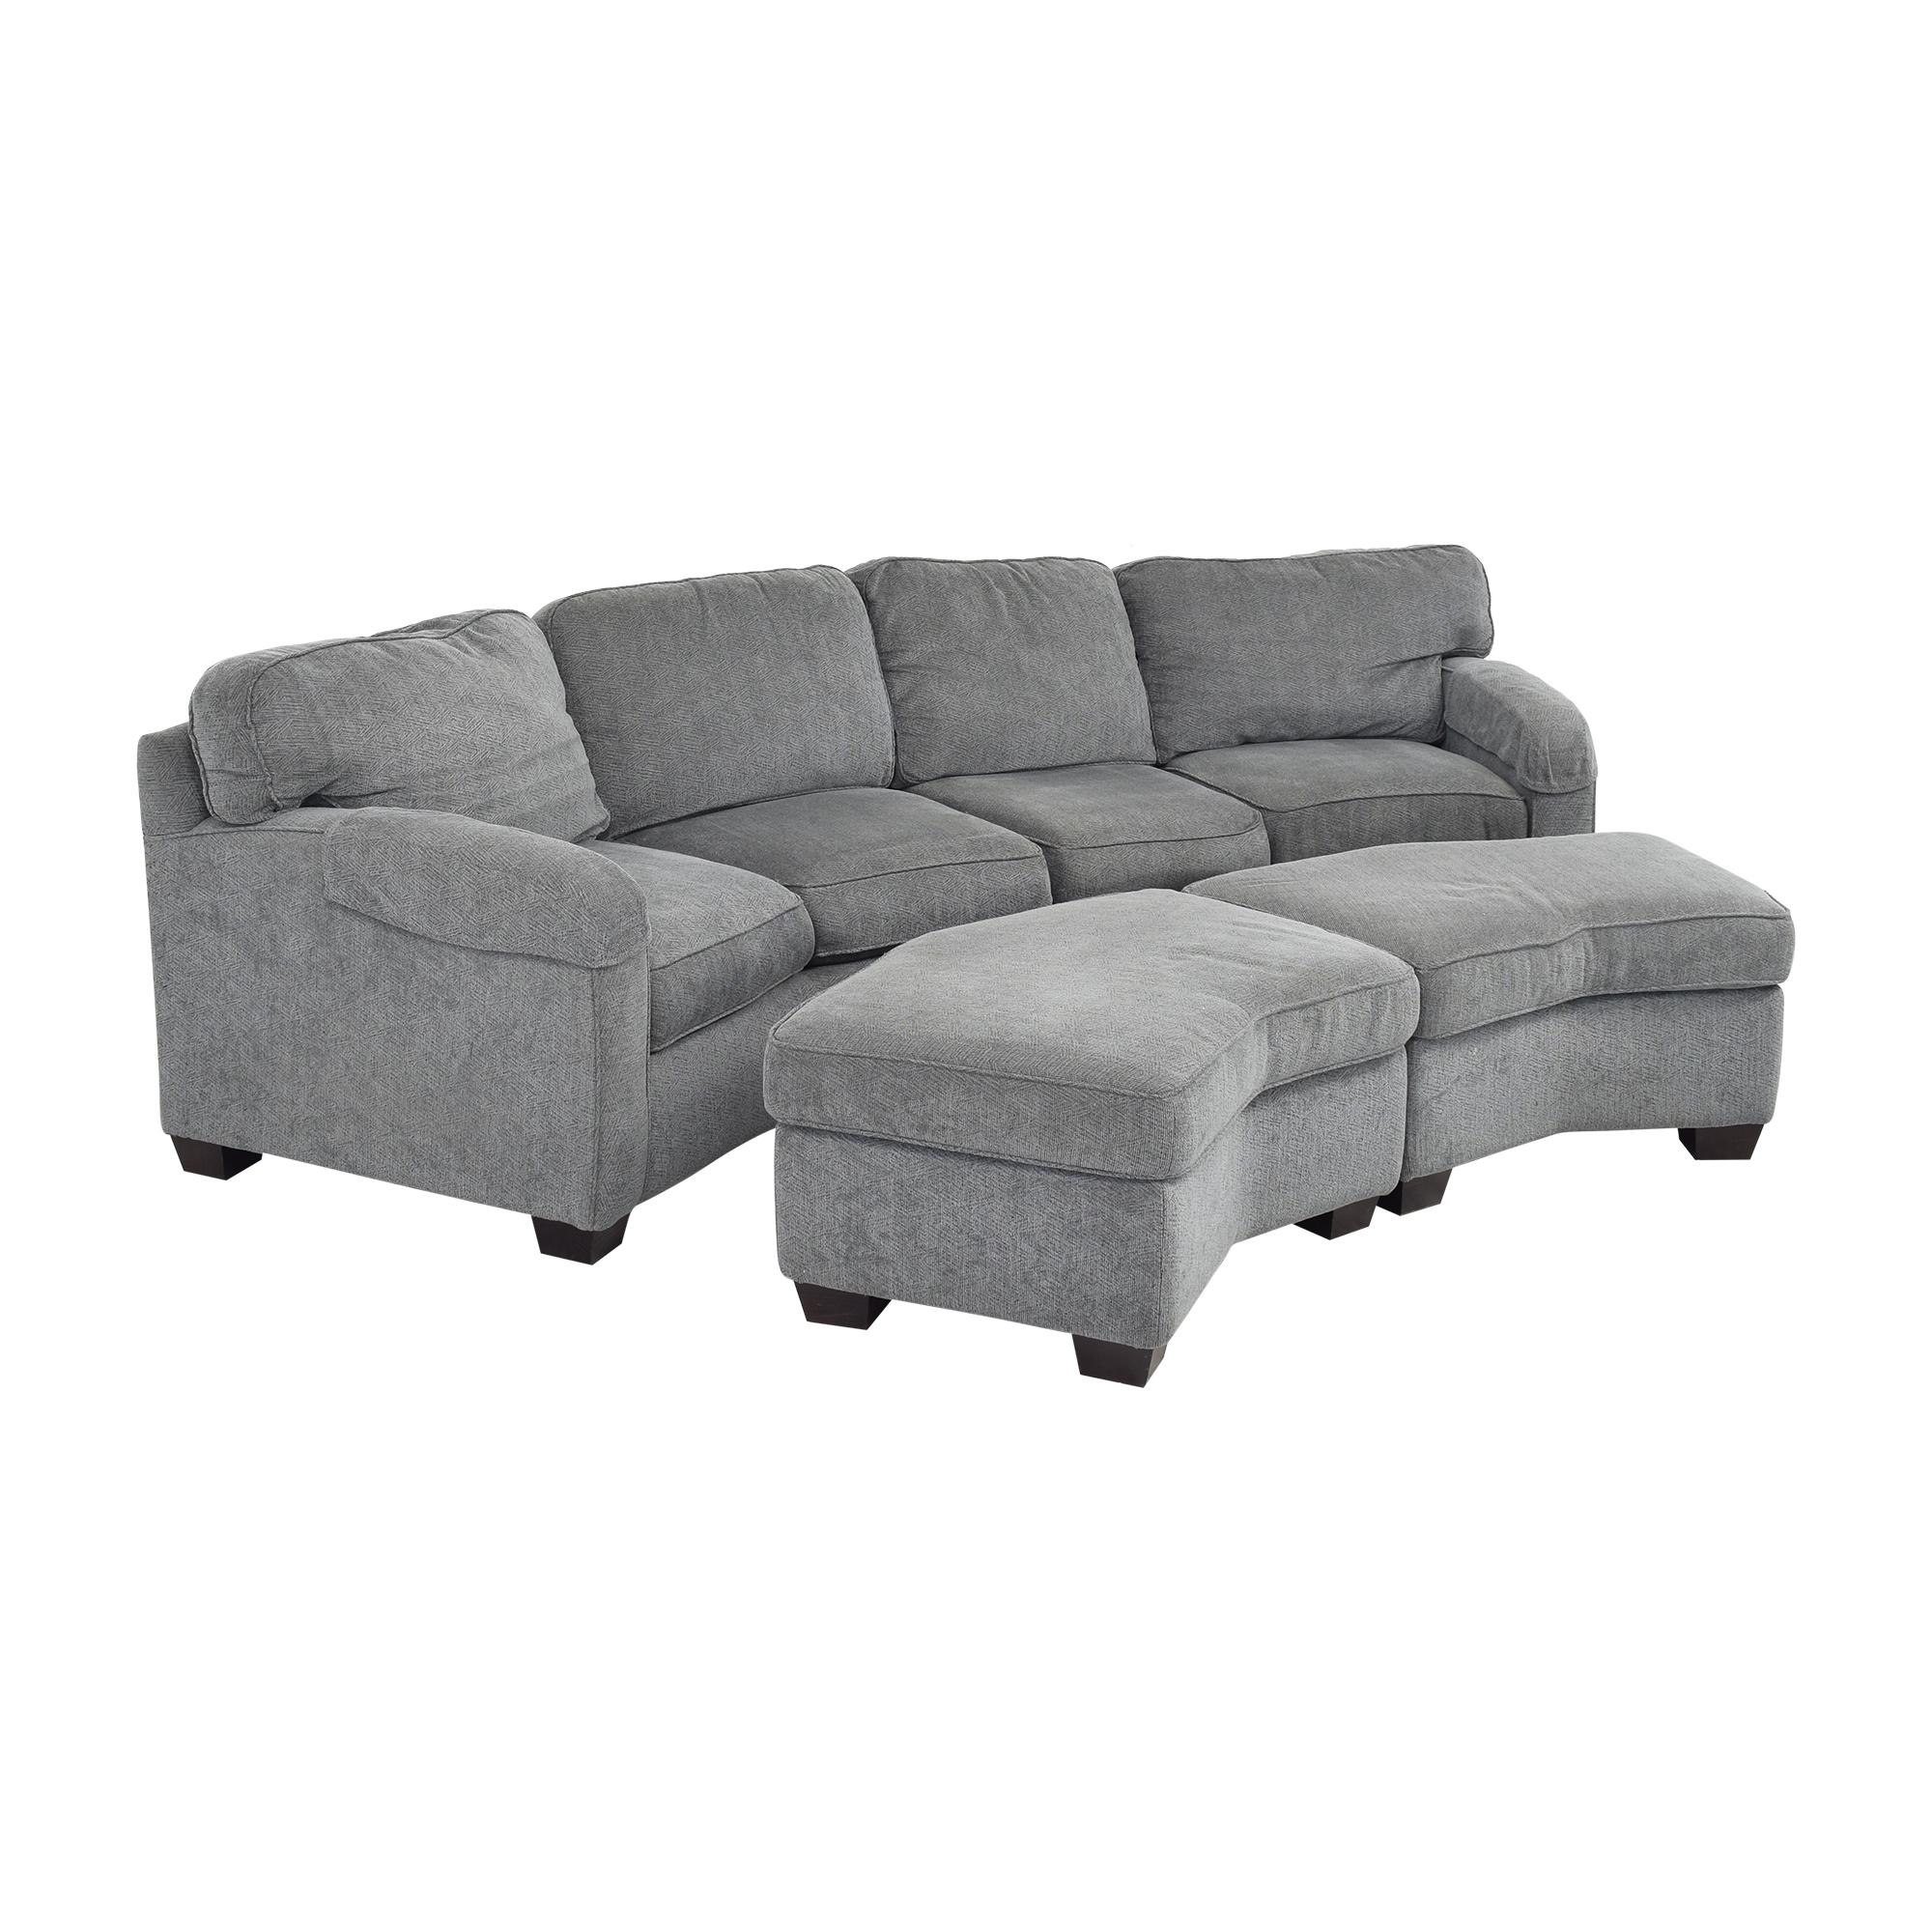 shop Bassett Furniture Sectional Sofa with Ottomans Bassett Furniture